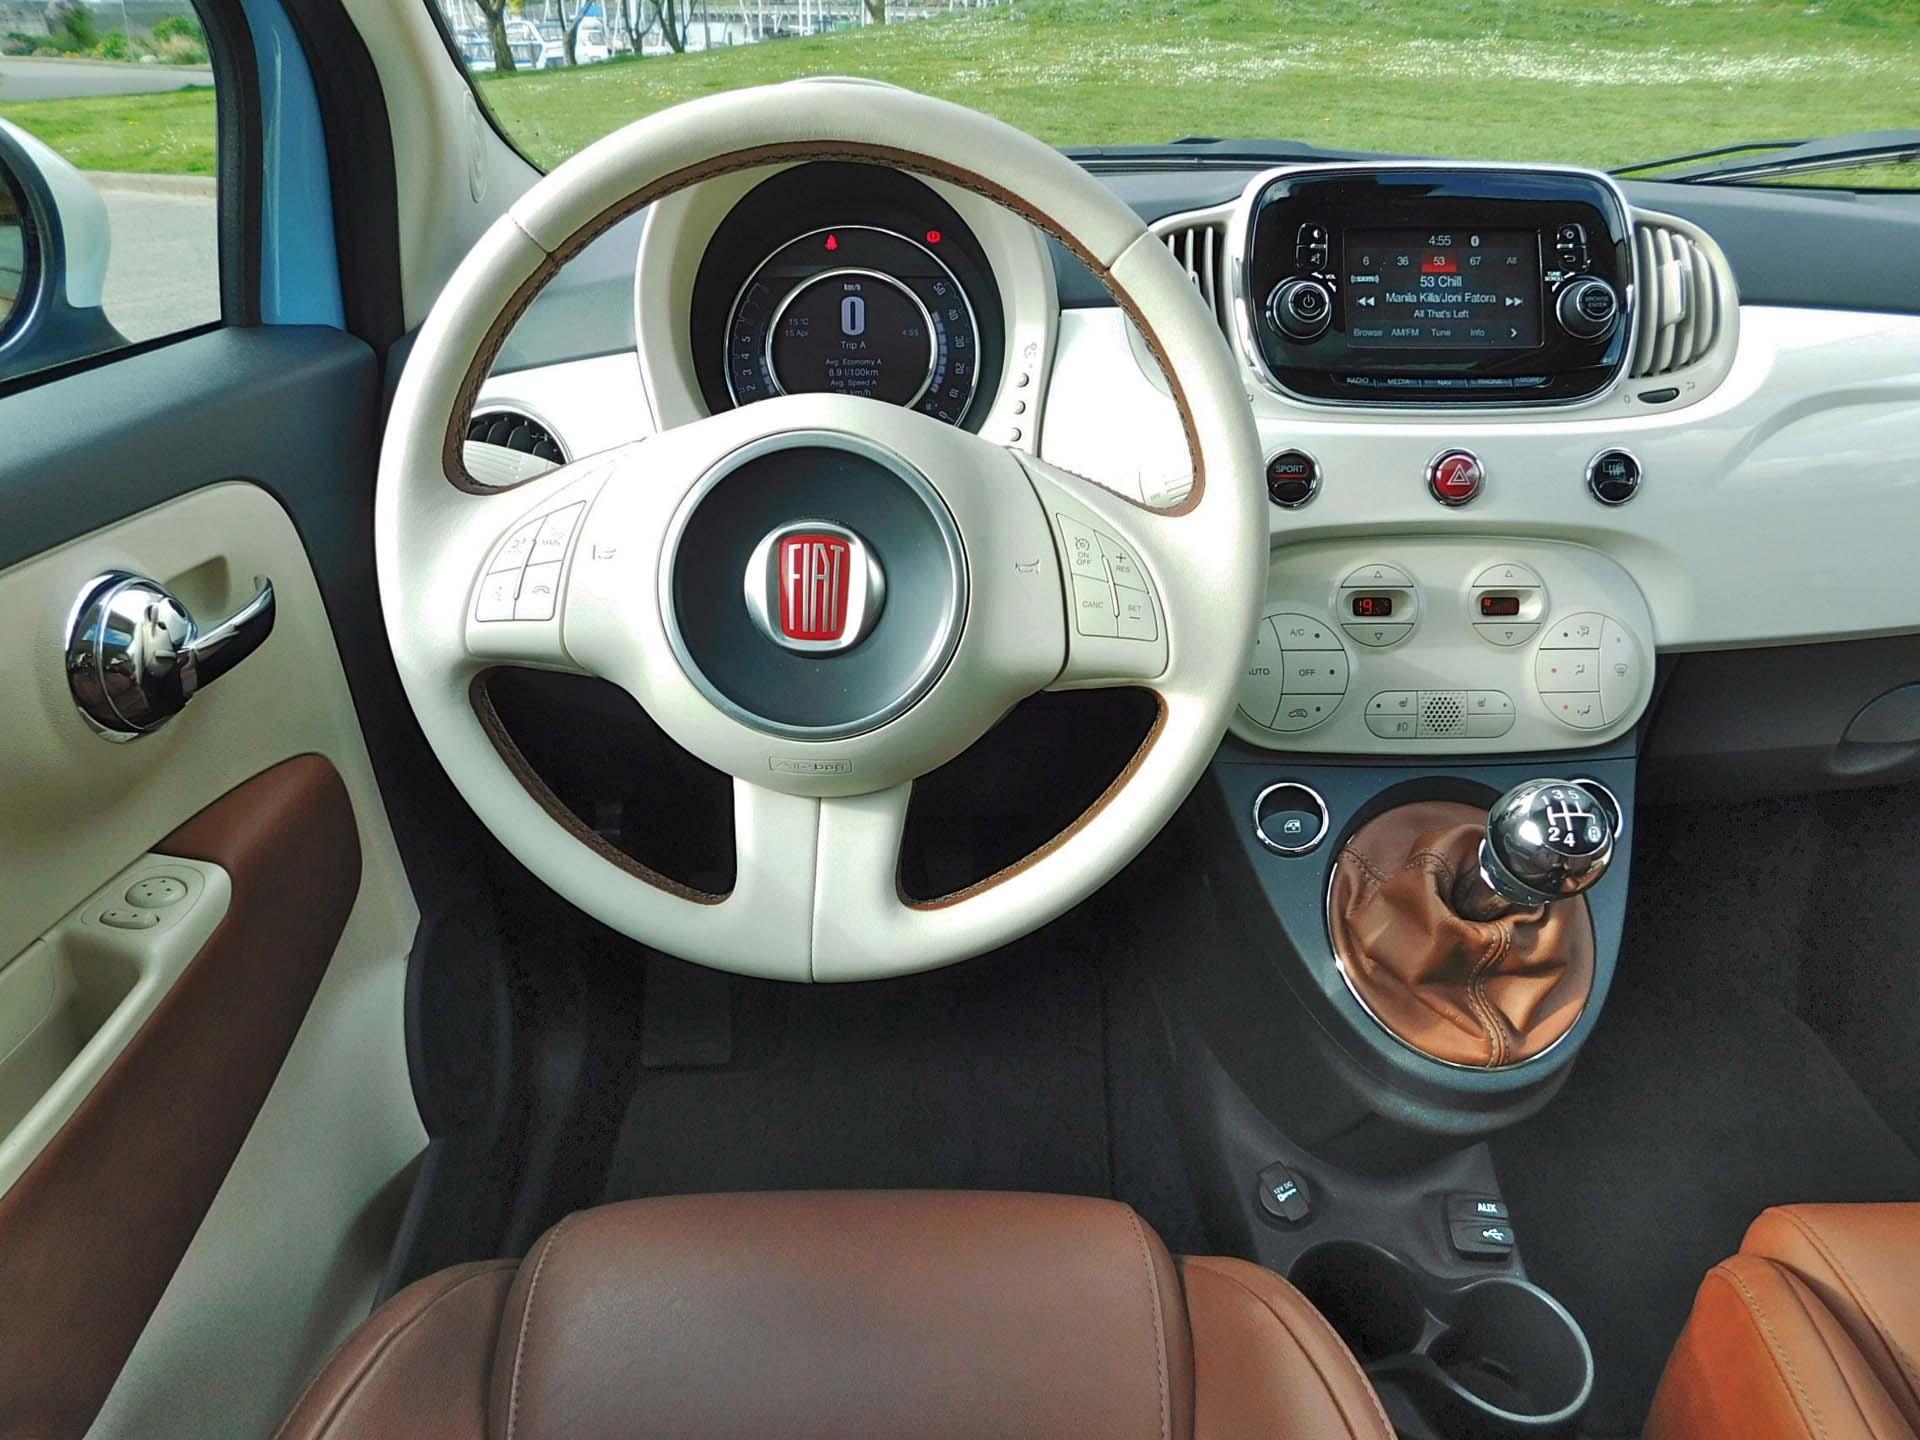 2016 Fiat 500 1957 Edition - Autos.ca